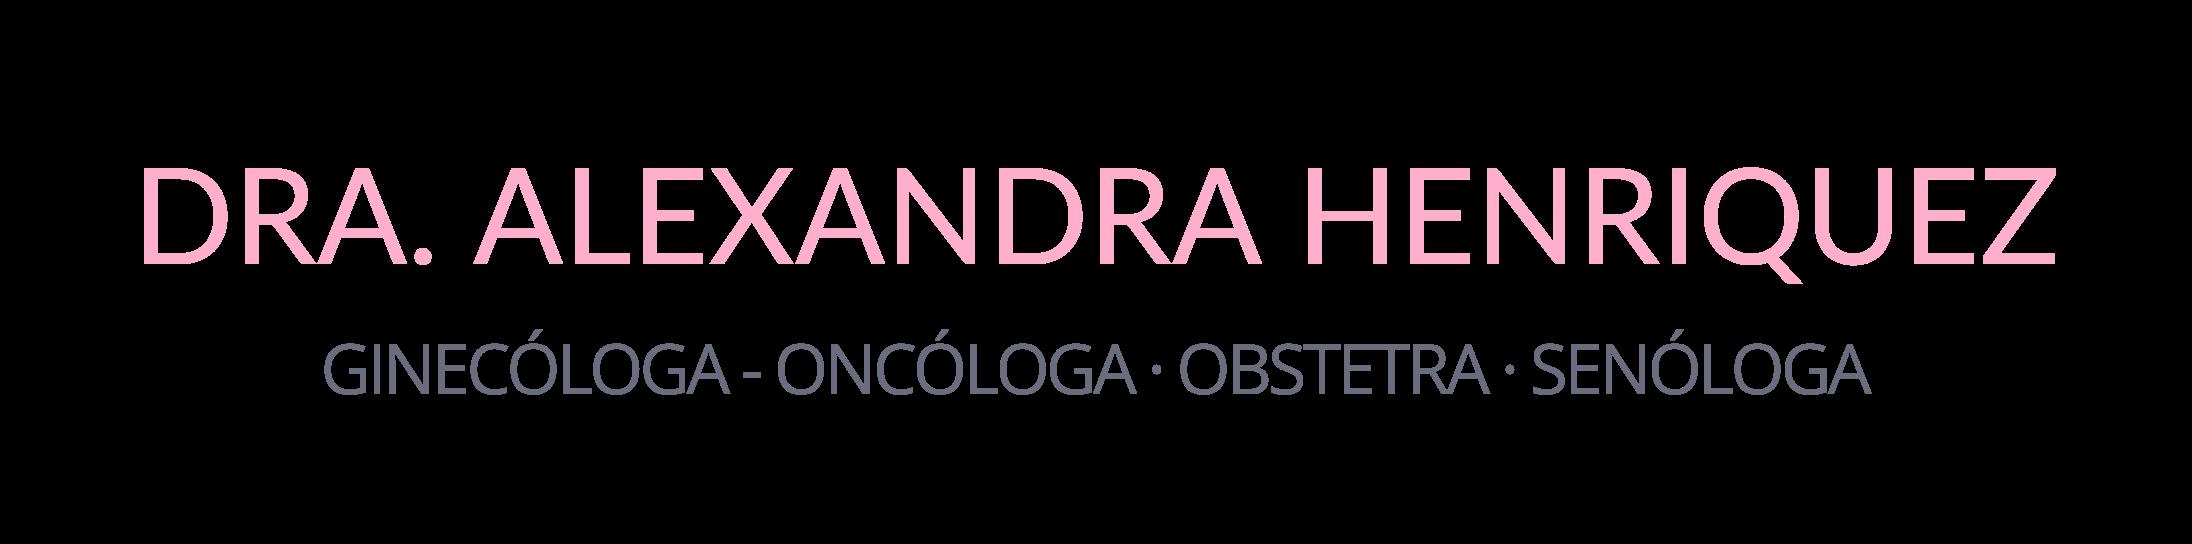 Dra. Alexandra Henriquez